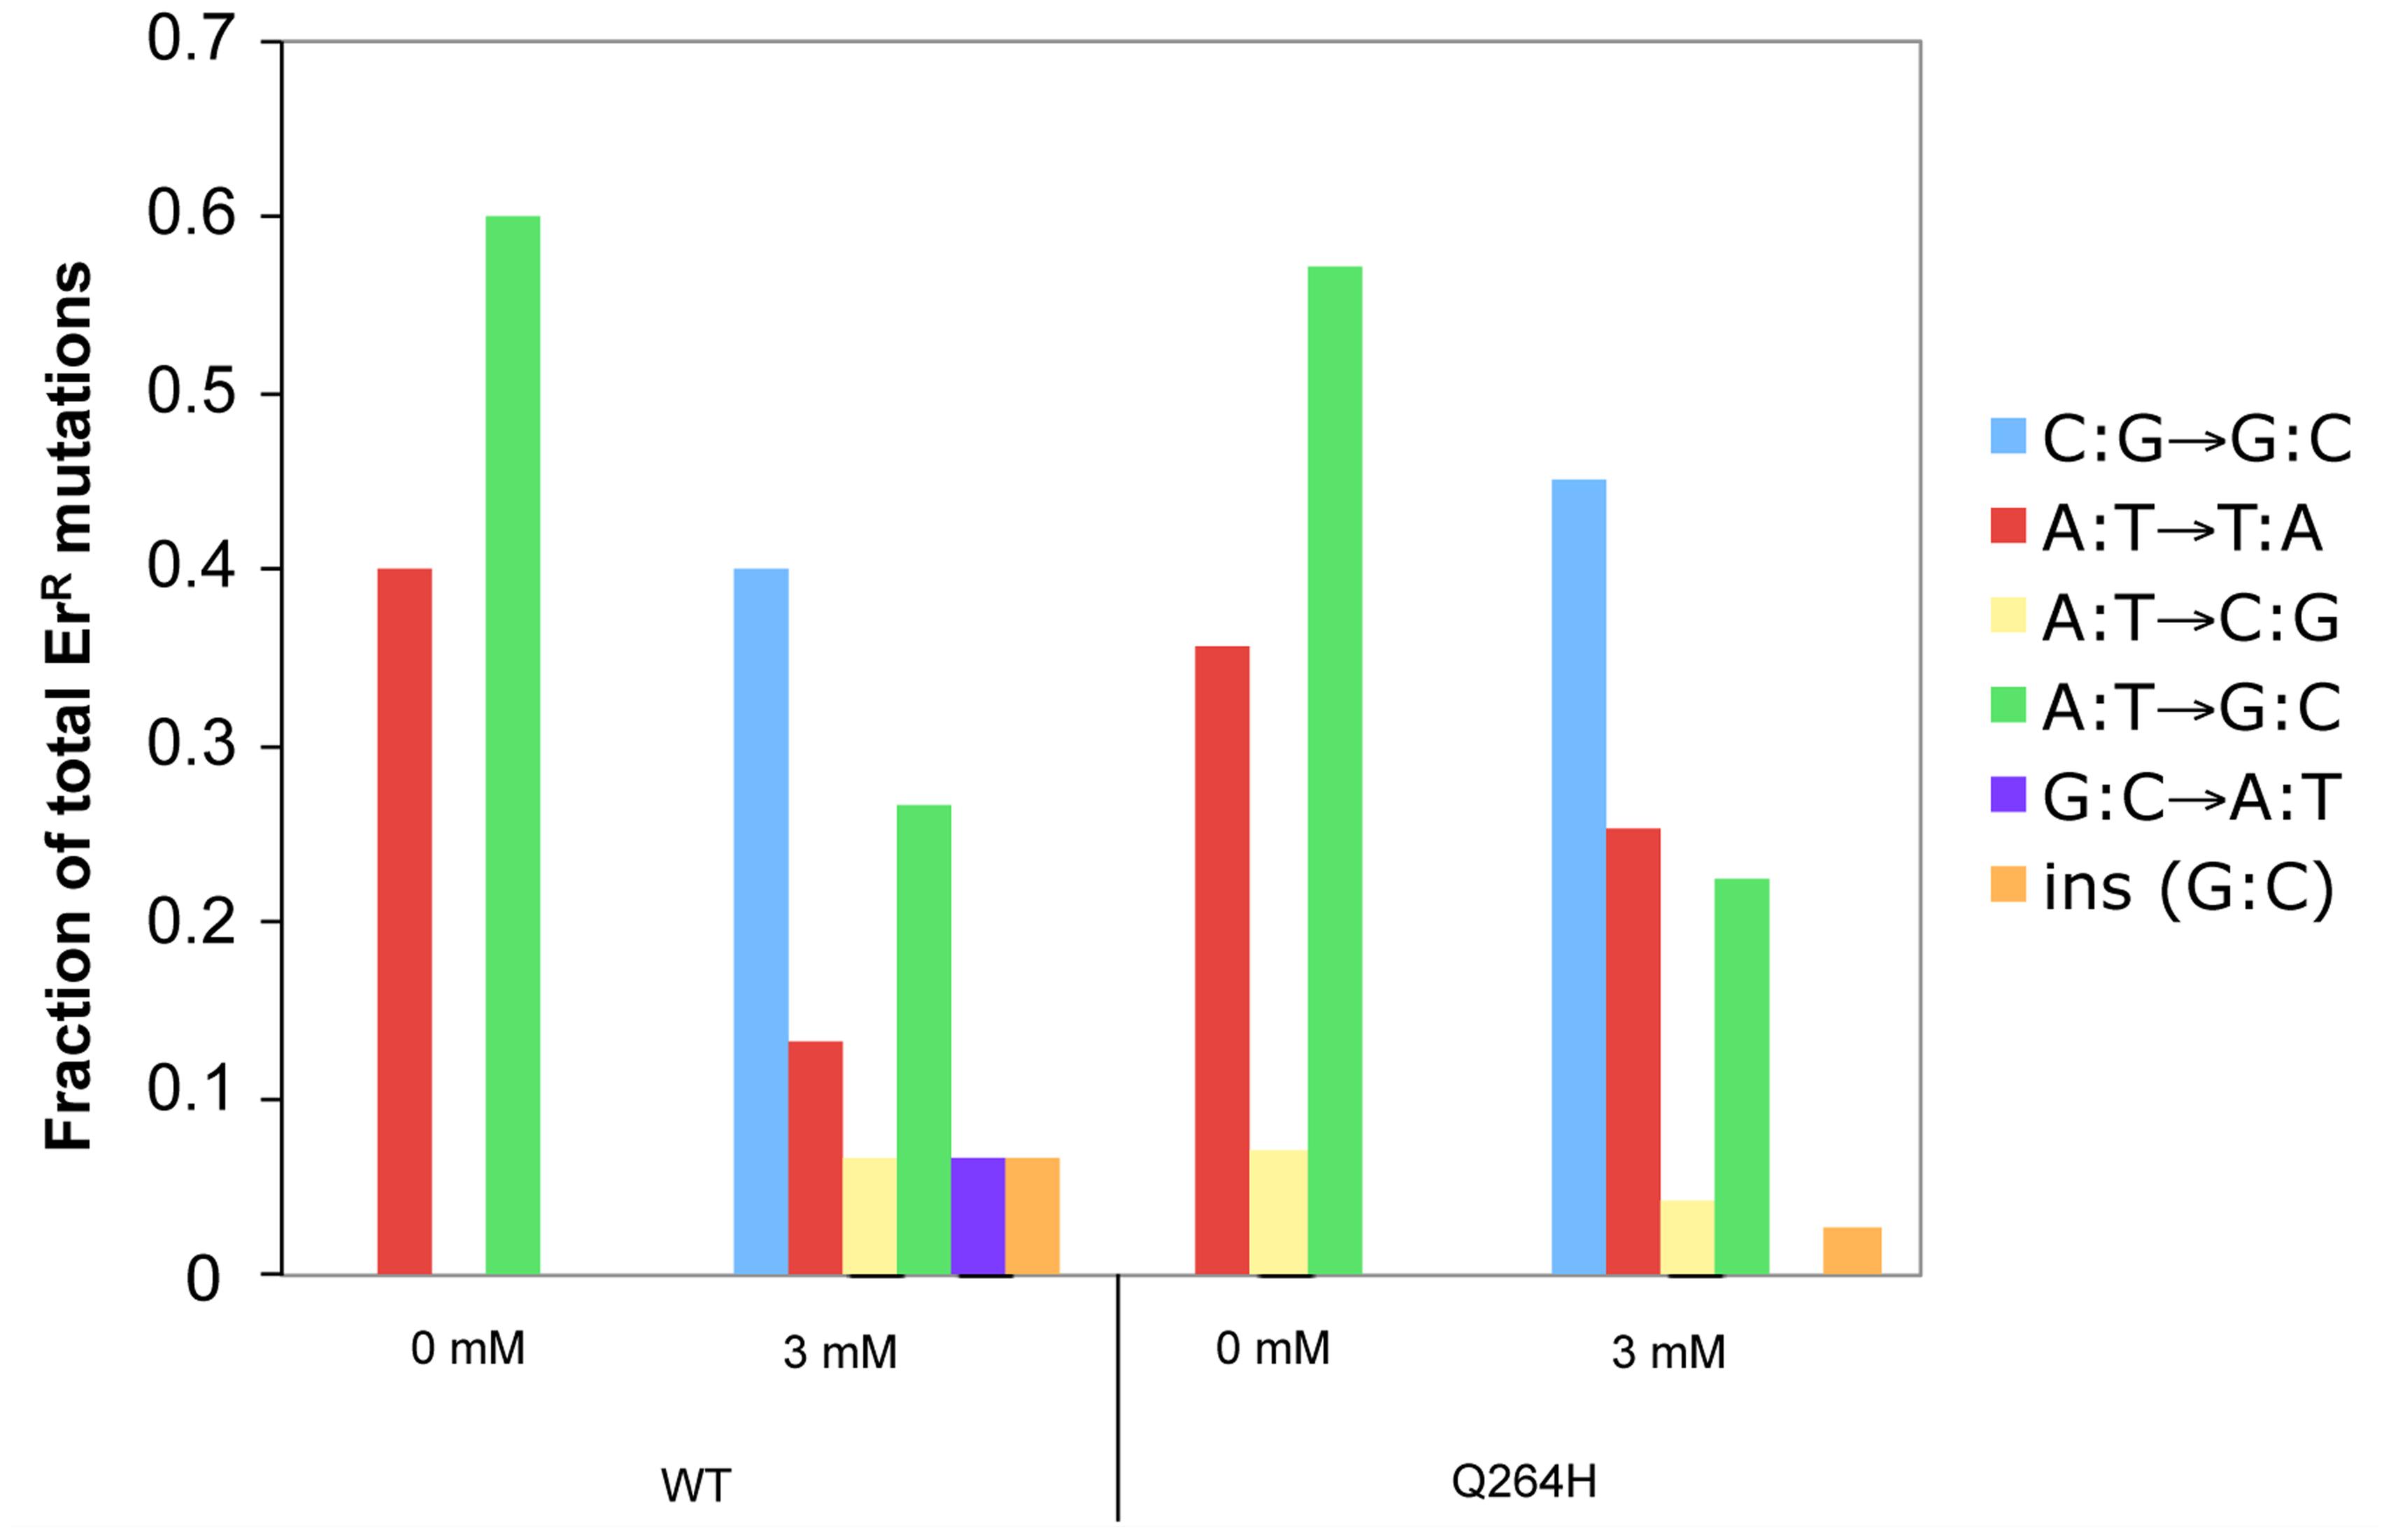 Methyl methanesulfonate exposure resulted in C:G→G:C transversions in mtDNA.